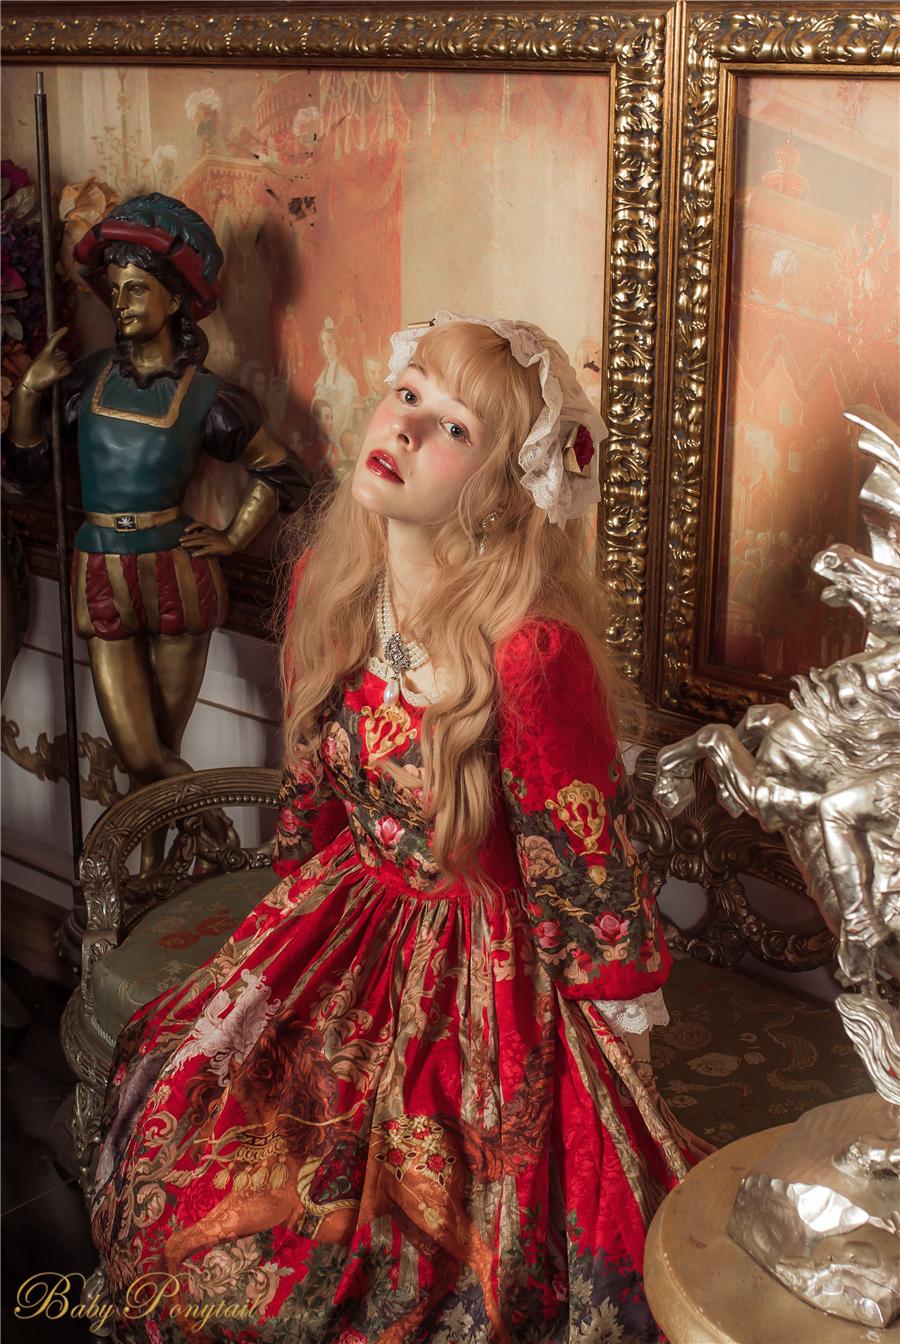 BabyPonytail_Rose Battle_Model Photo_OP Red studio_Claudia_15.jpg